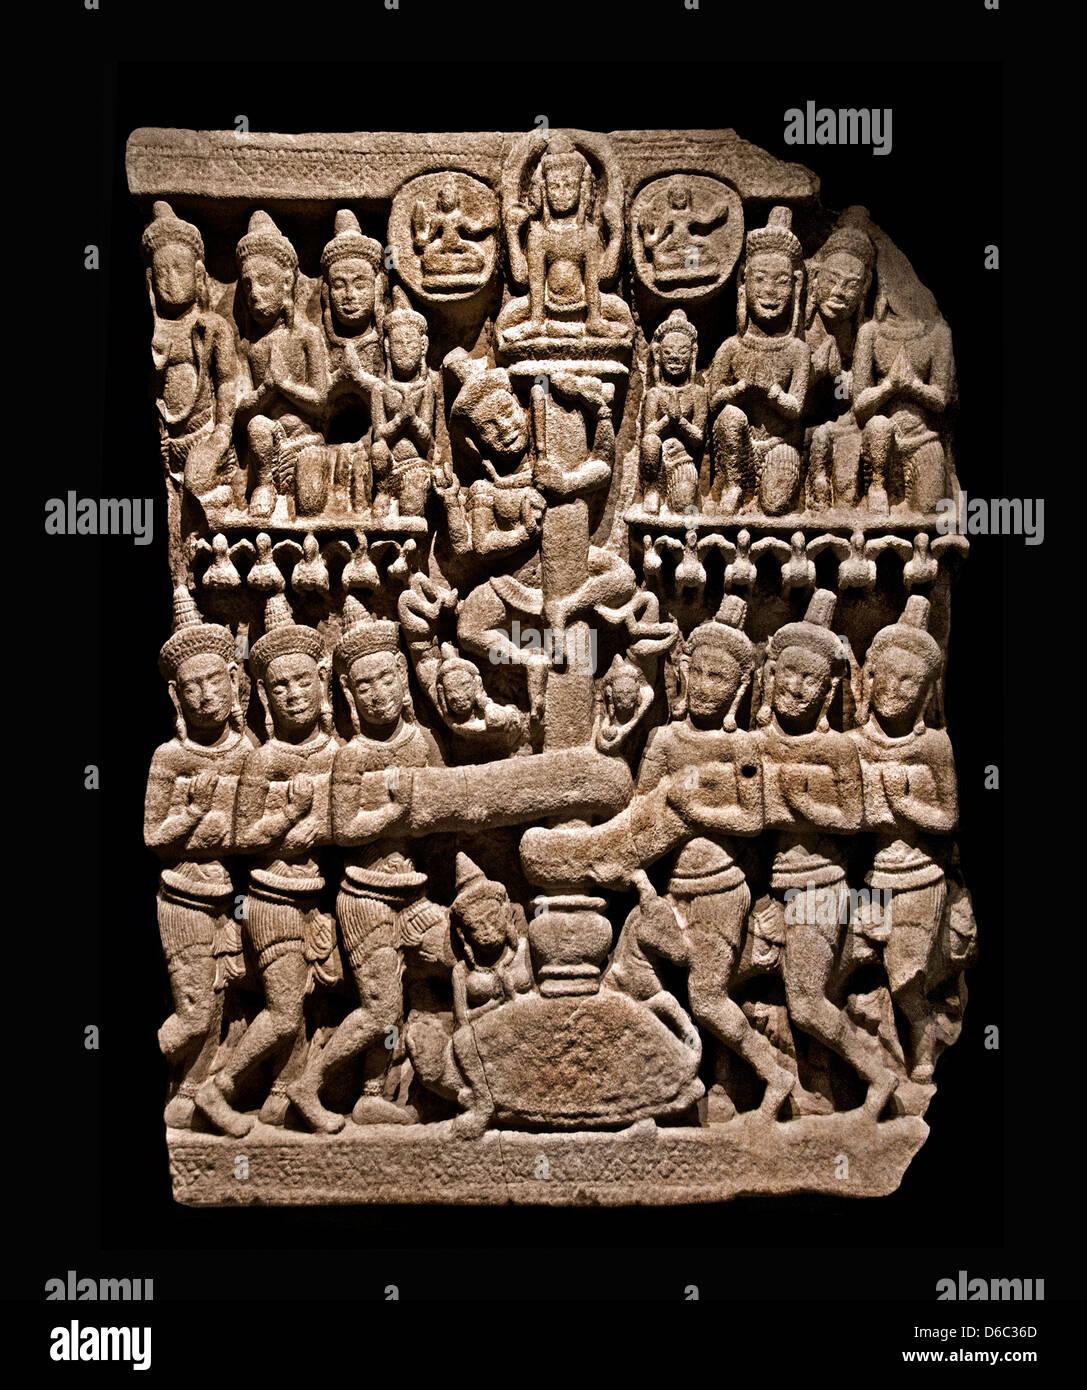 Churning Lake of Milk pediment fragment of the demons brewing  extract Amrita liquor of immortality 12th century - Stock Image